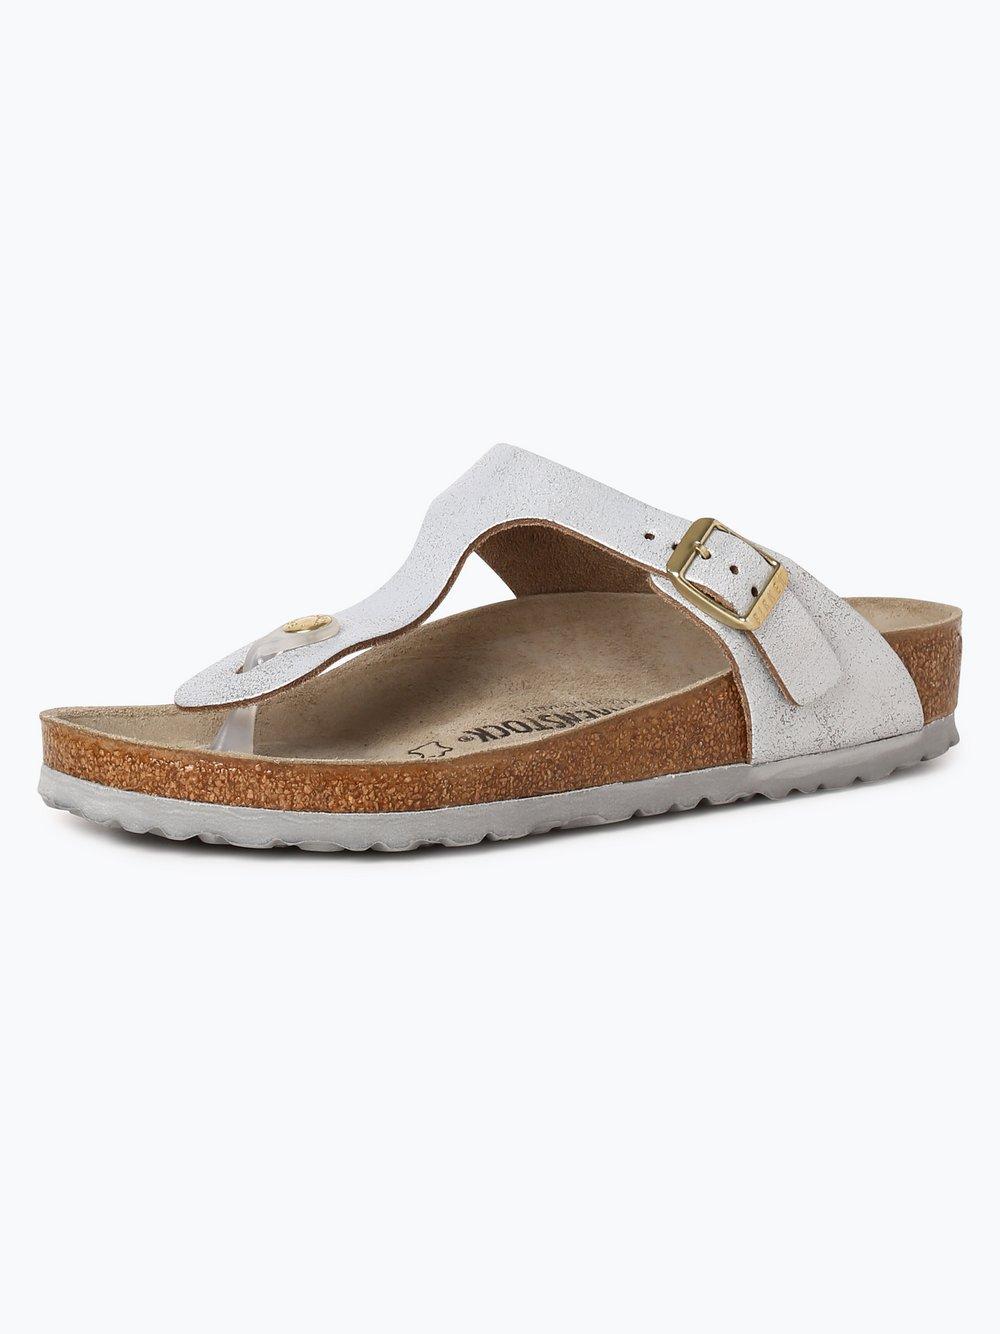 Birkenstock Damen Sandalen aus Leder Gizeh BS online